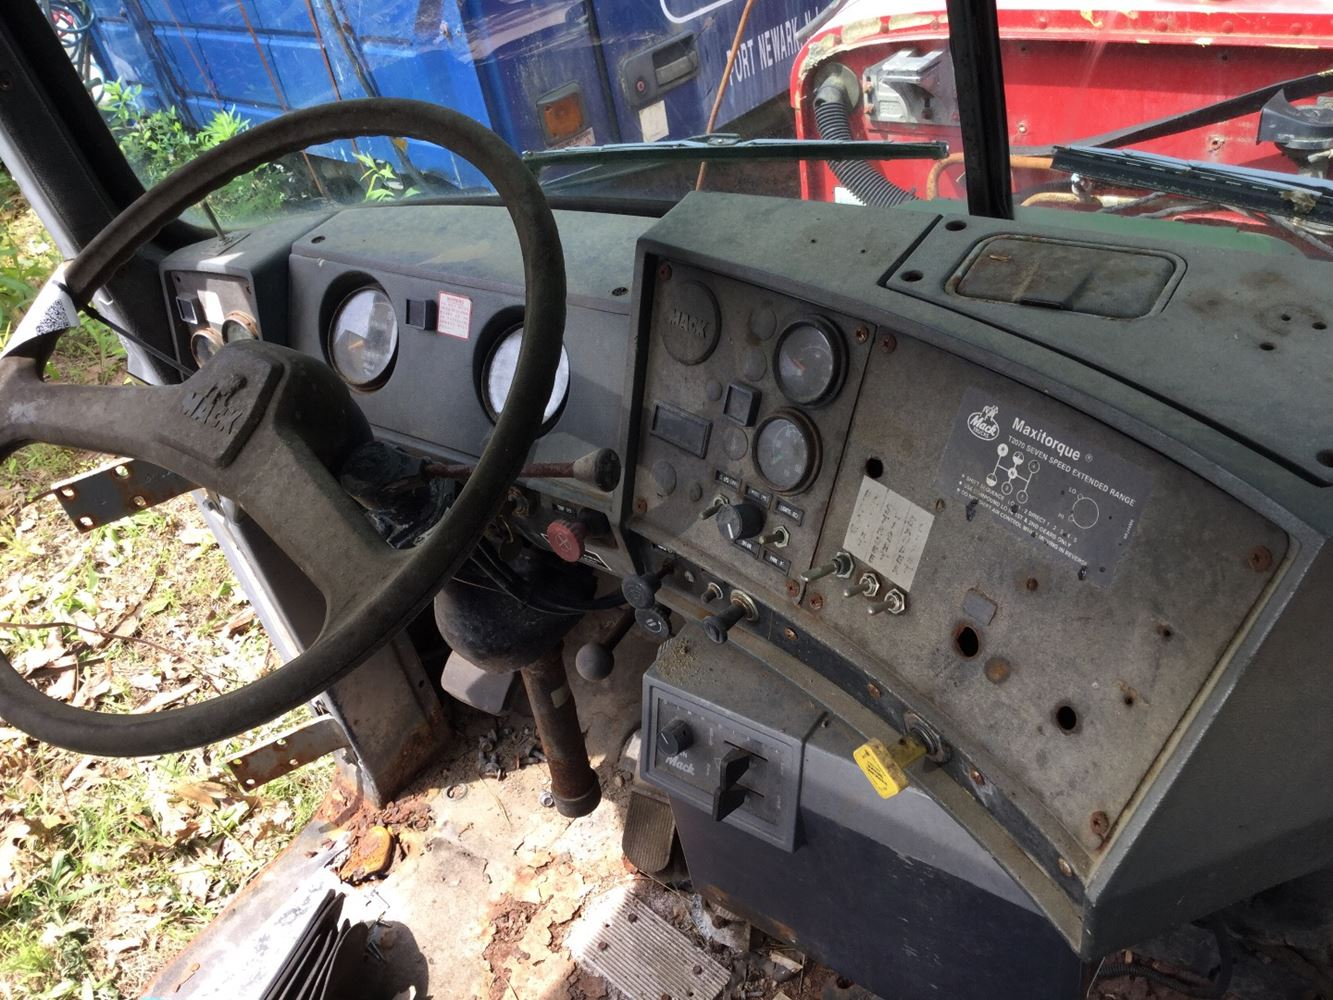 1989 Mack RD690S (Stock #SALVAGE-609-DASH-027) | Dash 'ys | TPI Mack Rd S Headlight Relay Wiring on